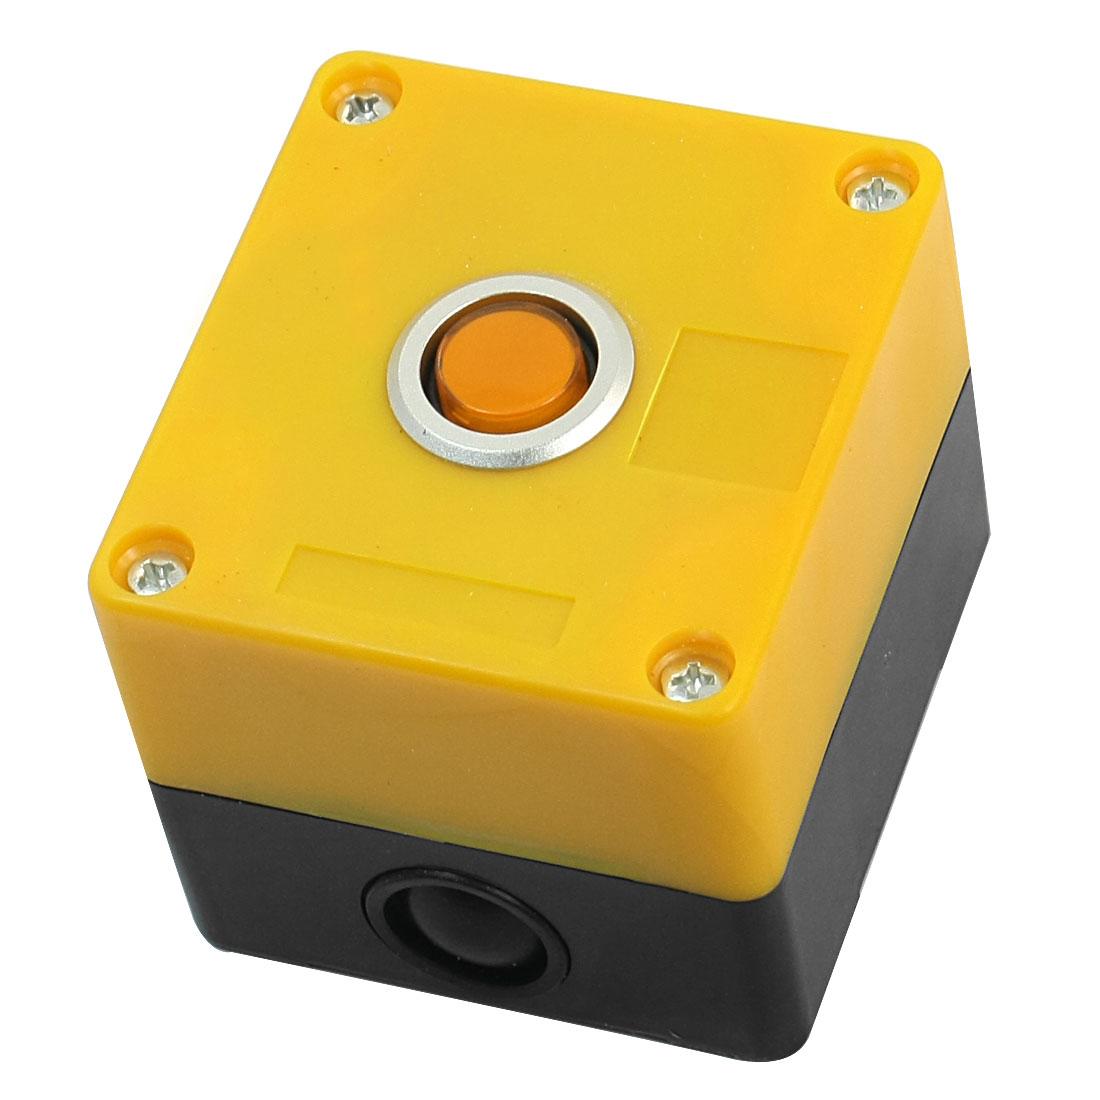 220V 15mm Dia Round Button Rectangle Plastic Case Orange Signal Indicator Light Pilot Lamp Blub w Yellow Box